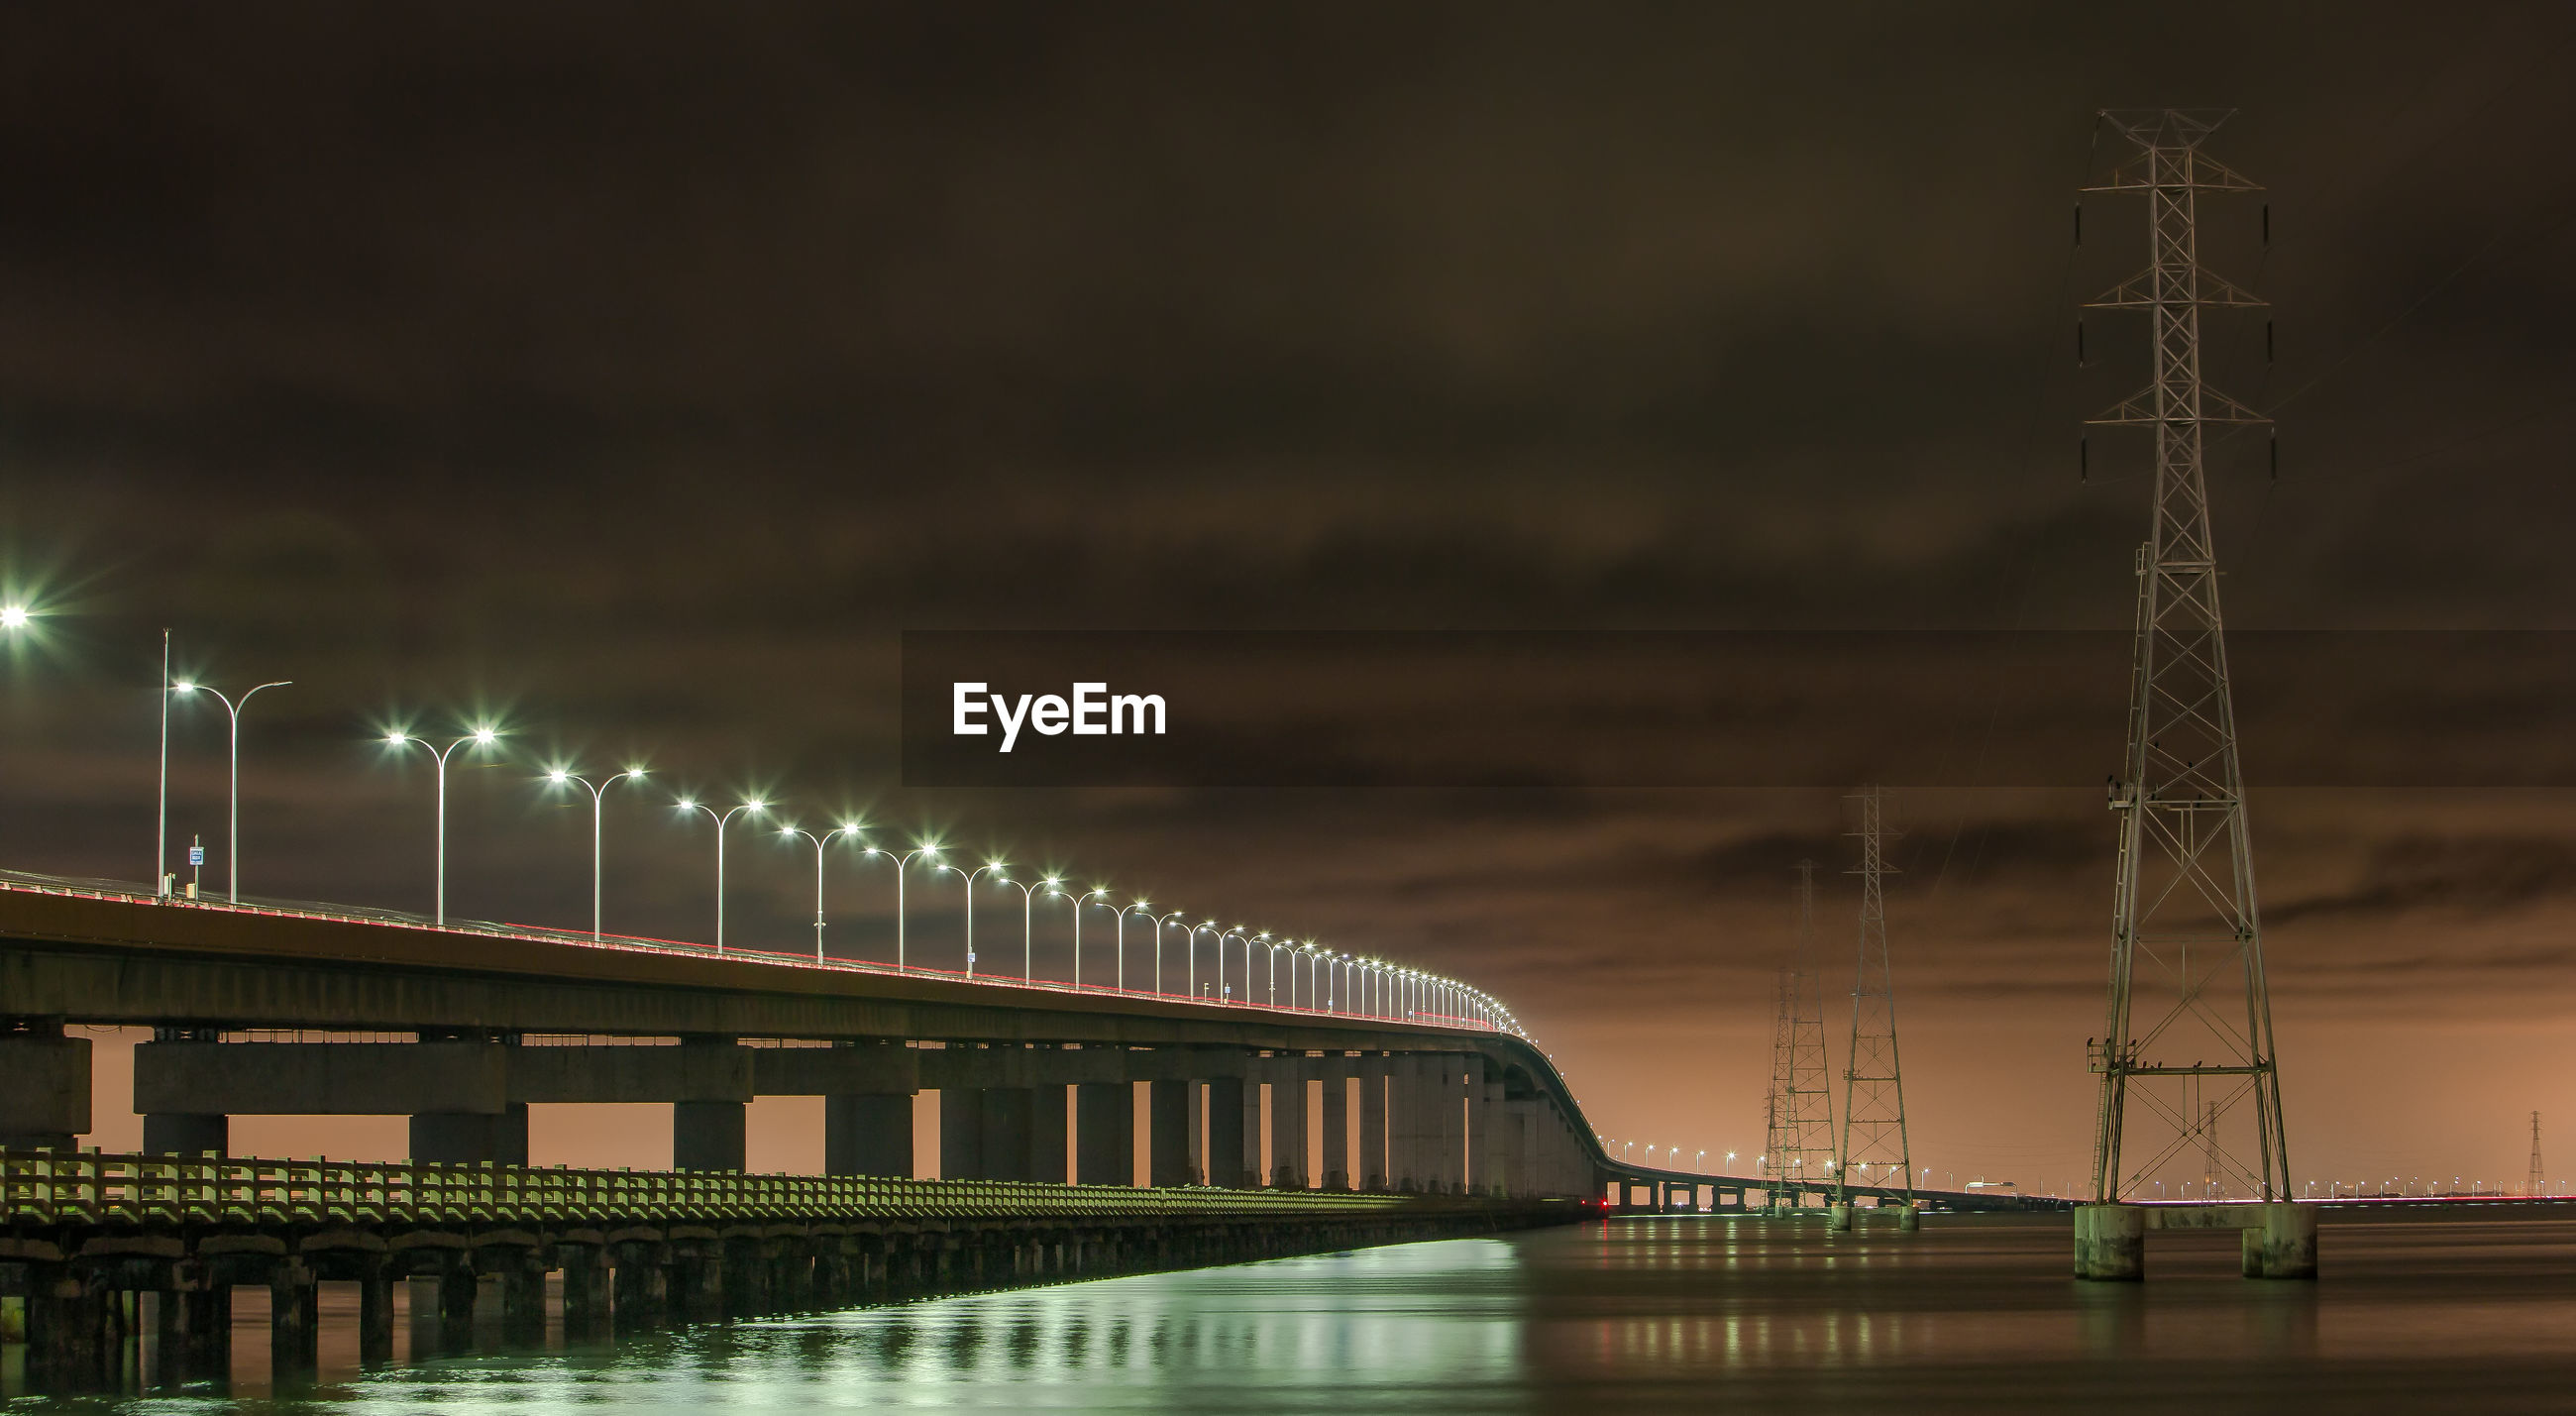 Illuminated san mateo-hayward bridge over river against cloudy sky at night